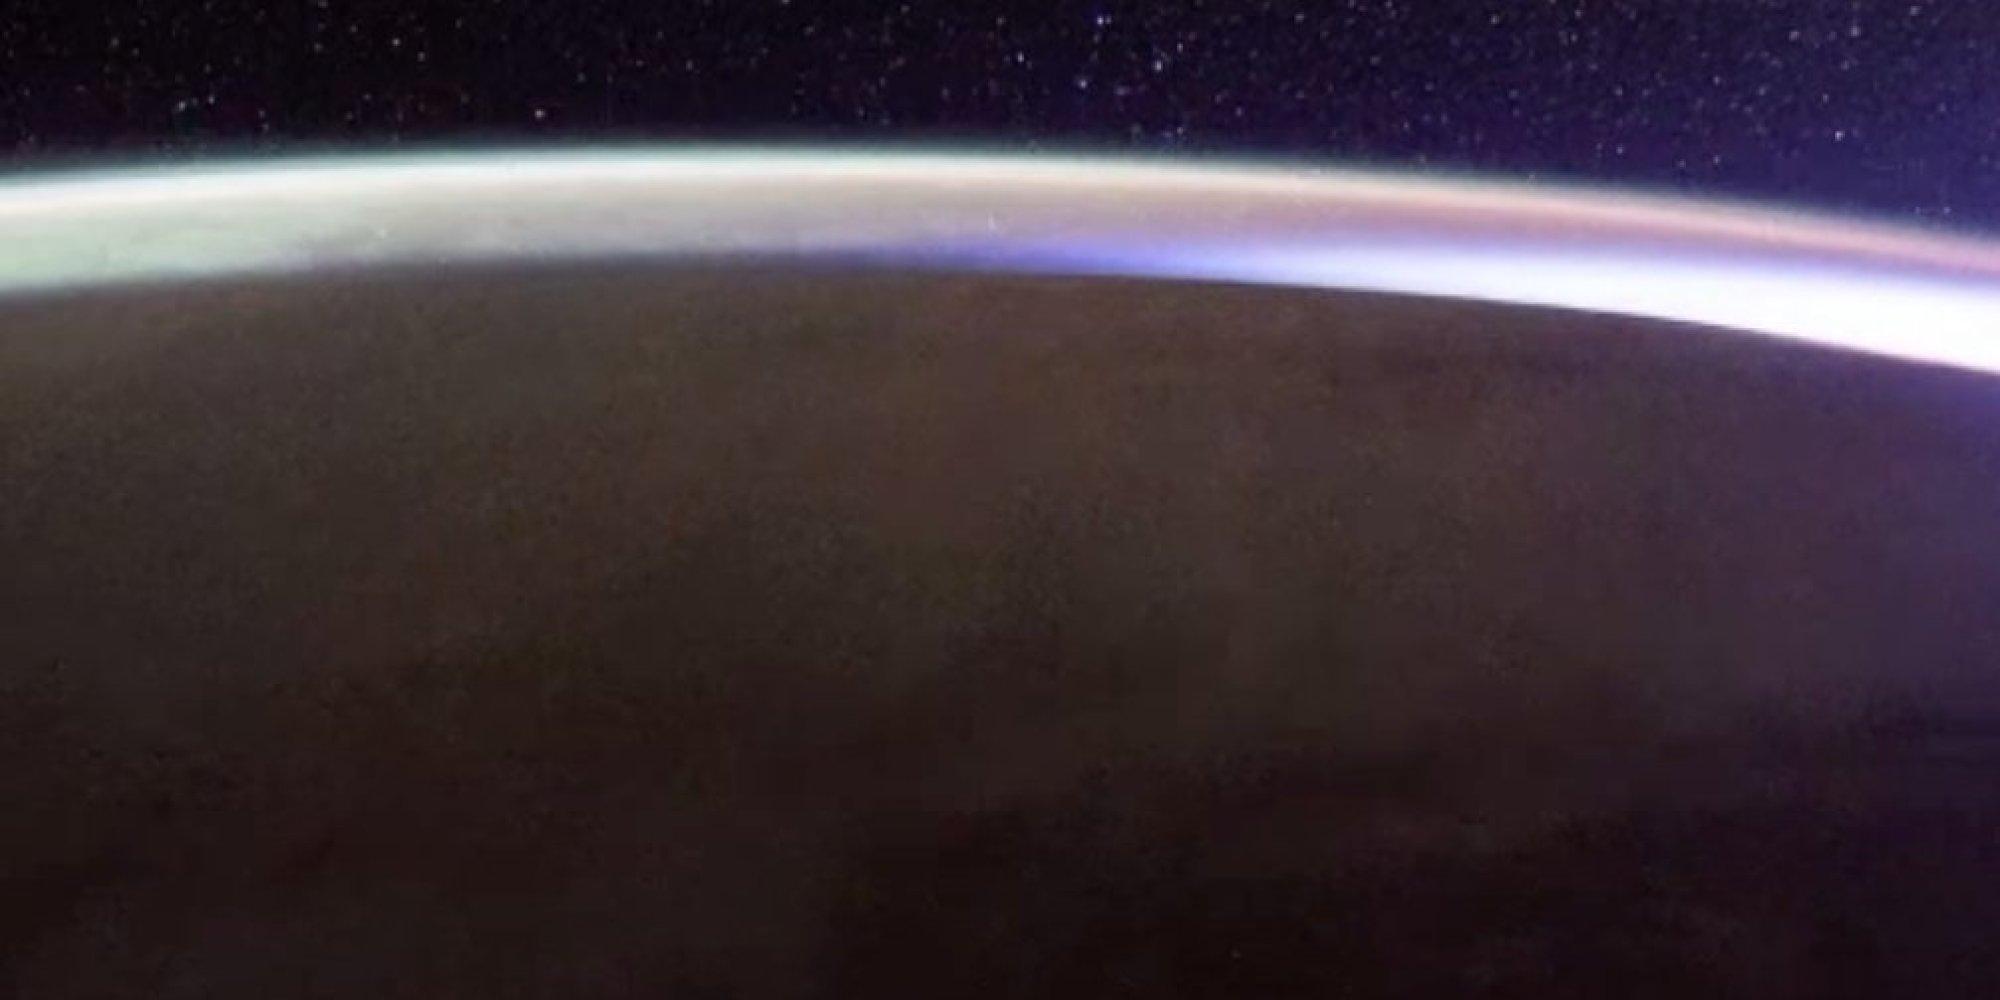 sunrise from international space station - photo #28